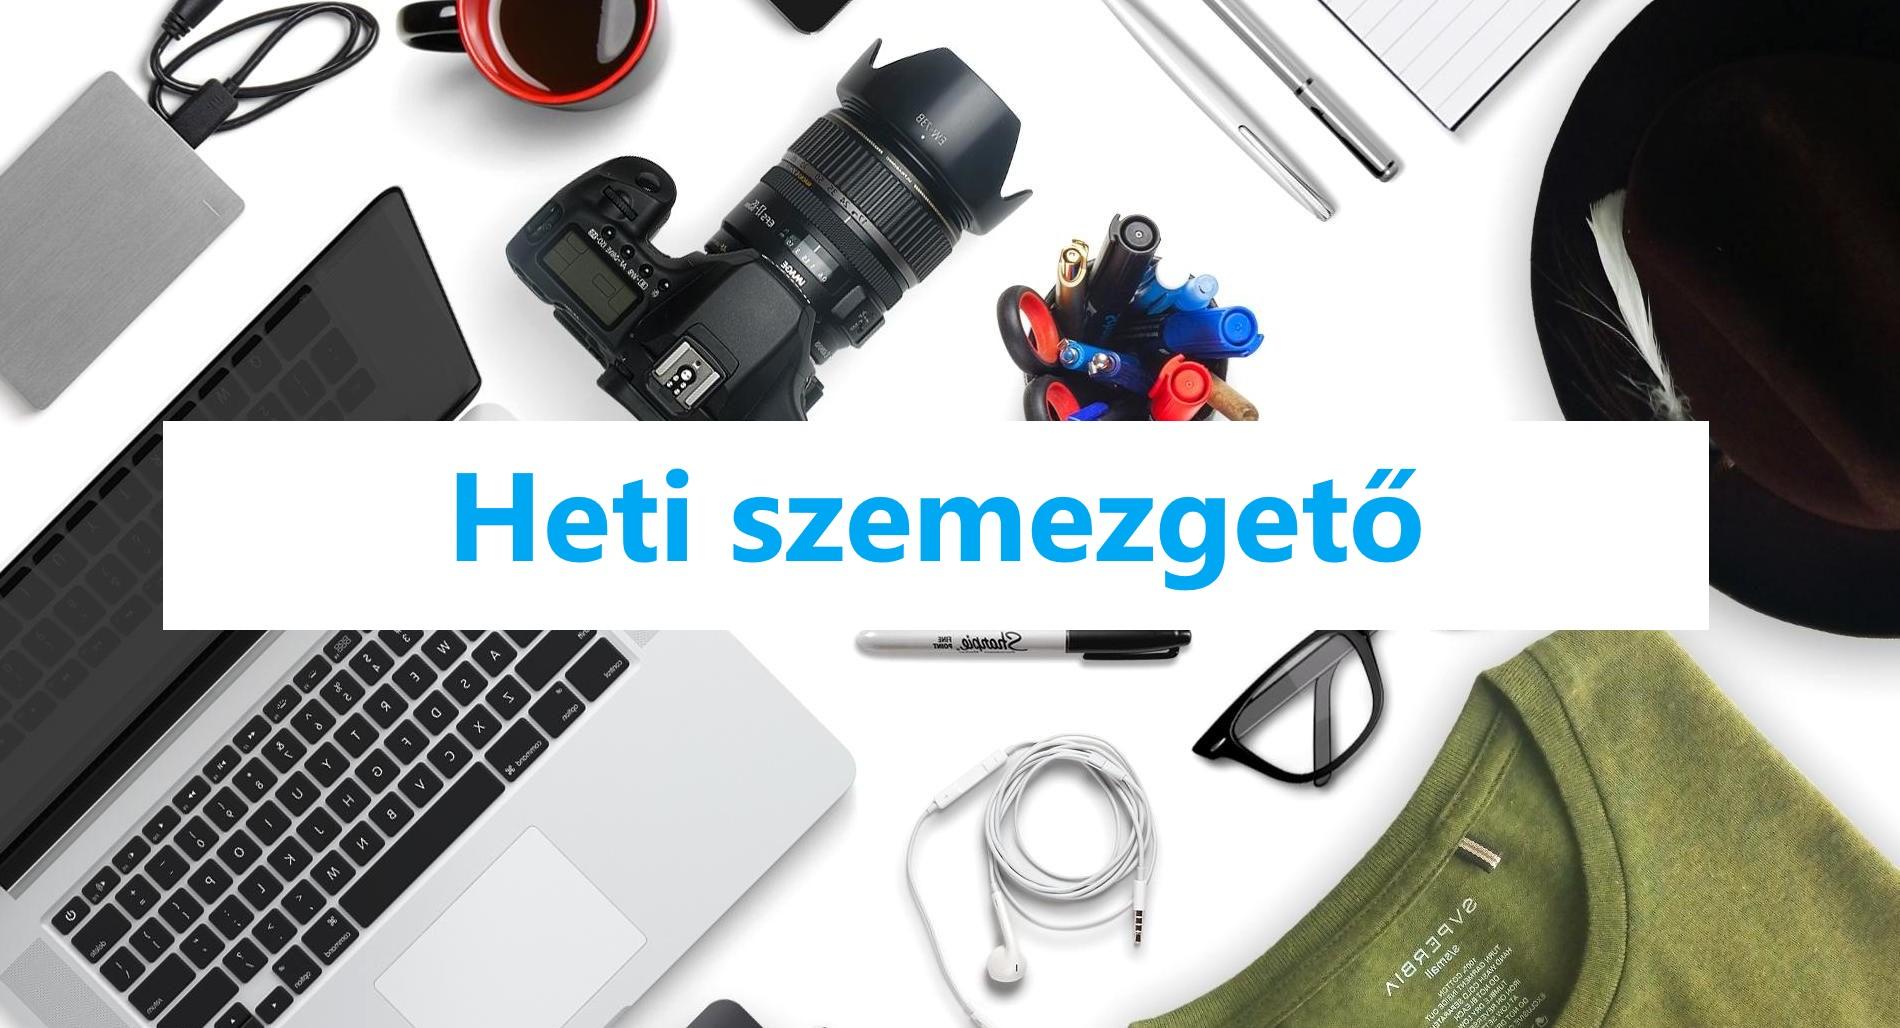 heti_szemezgeto_uj_124.jpg